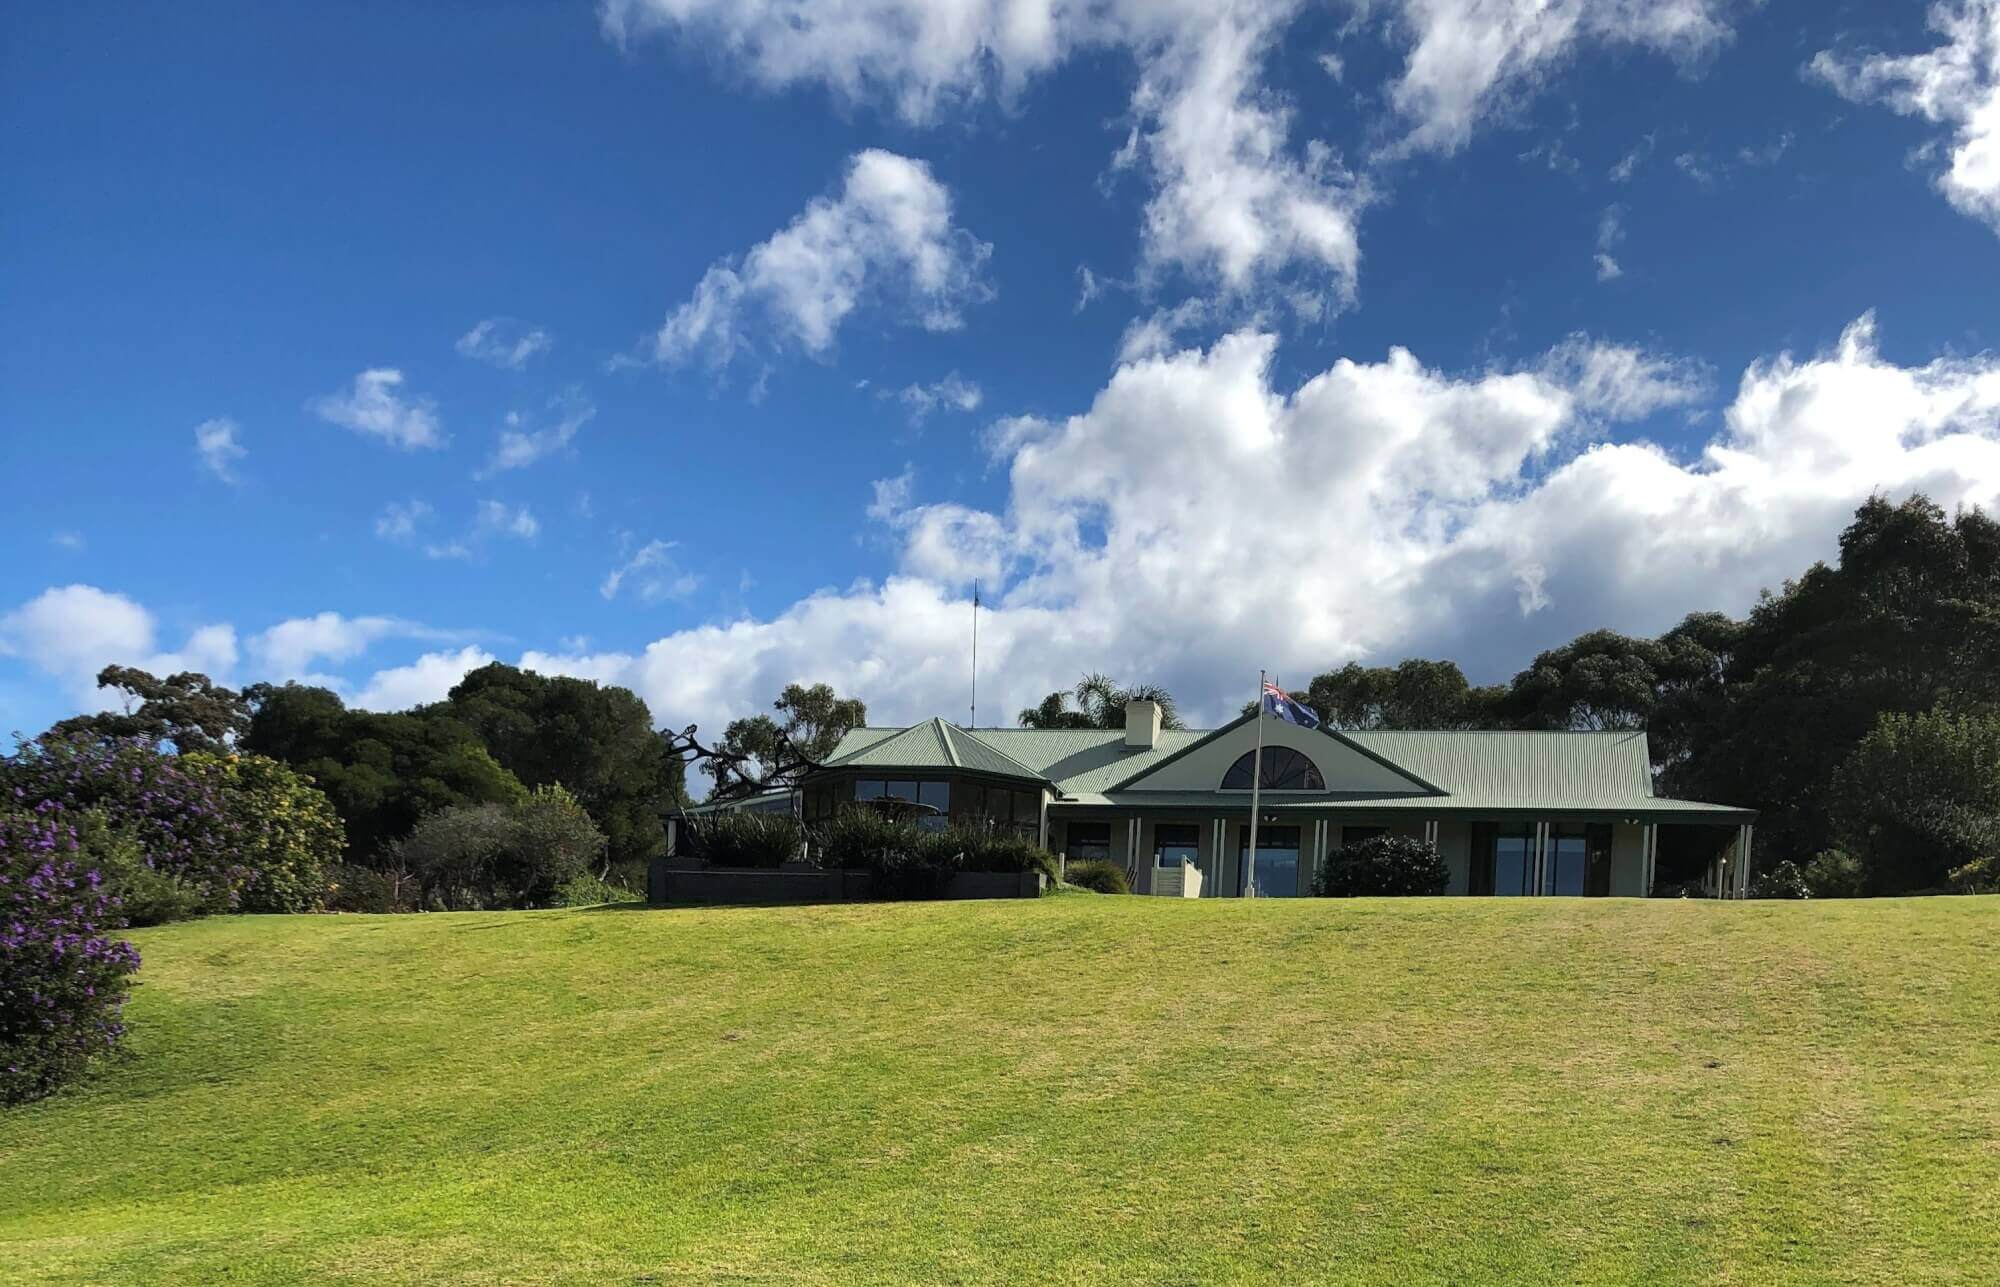 Property for sale 73 Lakeshore Drive Nungurner VIC 3909